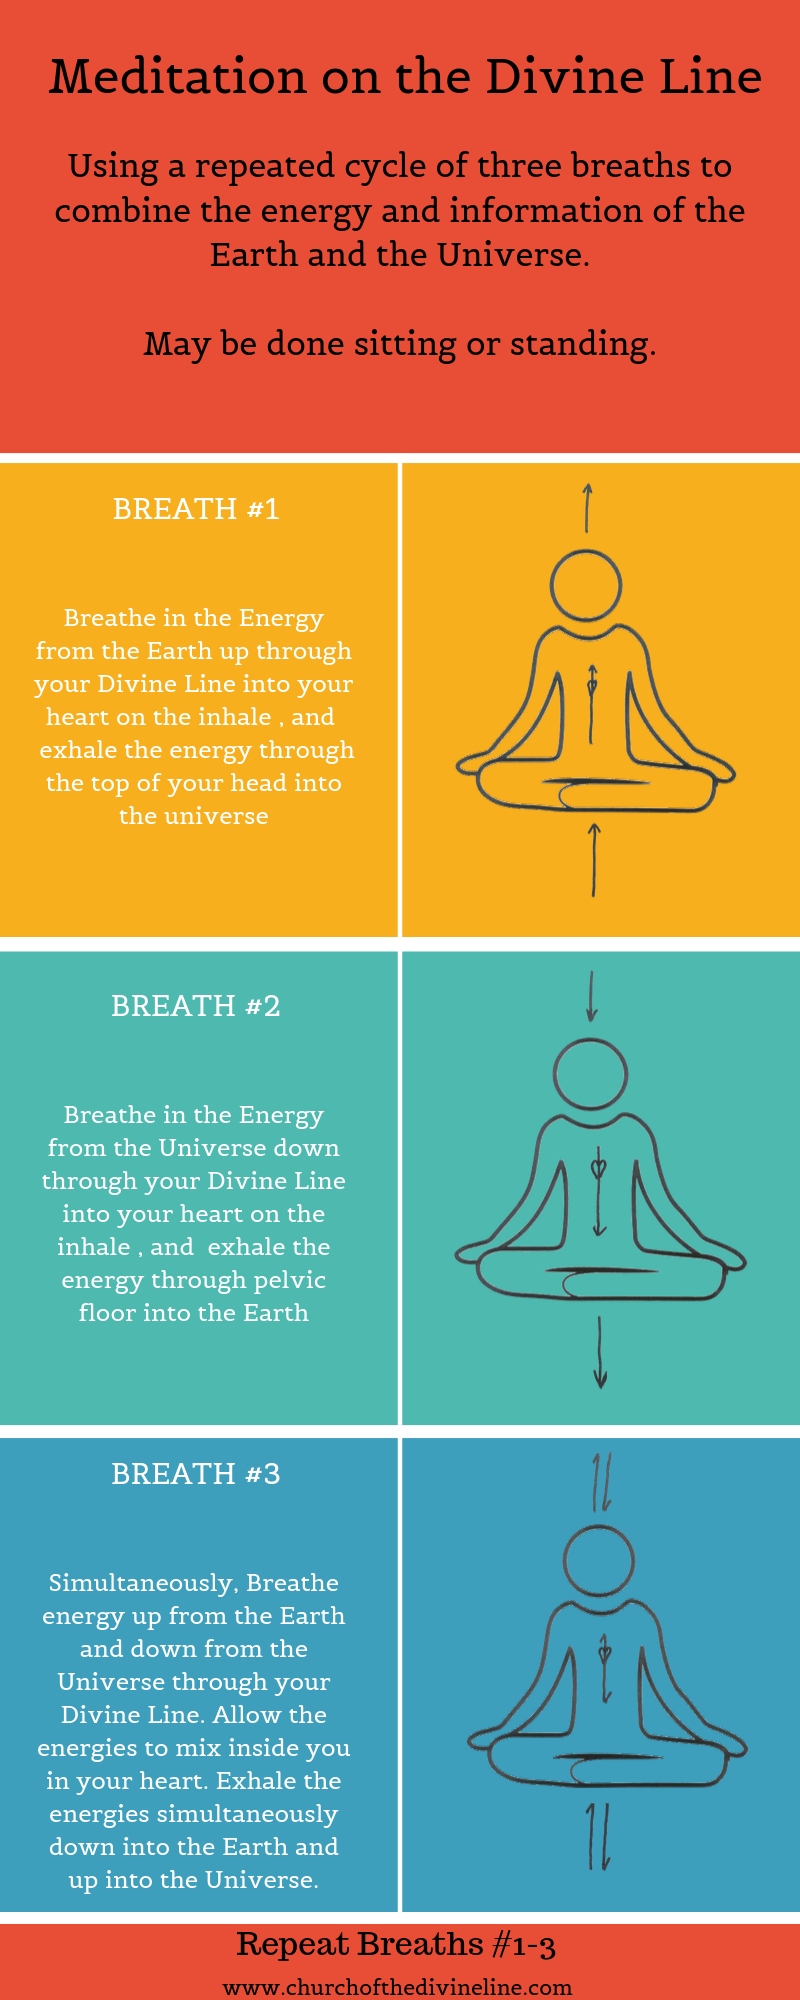 Description of the Divine Line Meditation